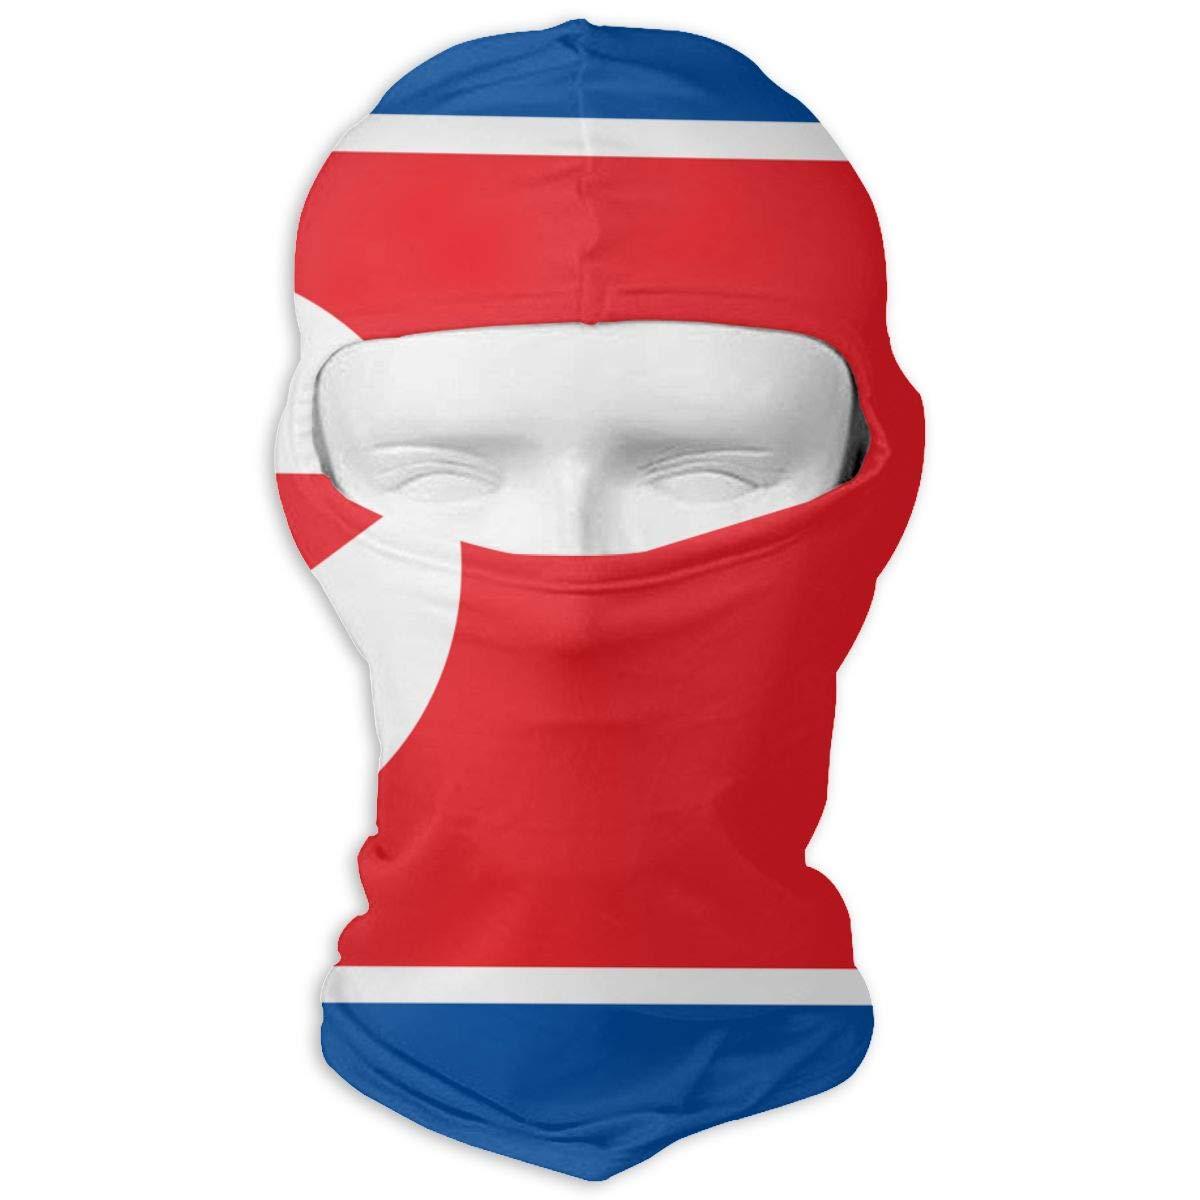 LaoJi North Korea Flag Winter Ski Mask Balaclava Hood Wind-Resistant Face Mask